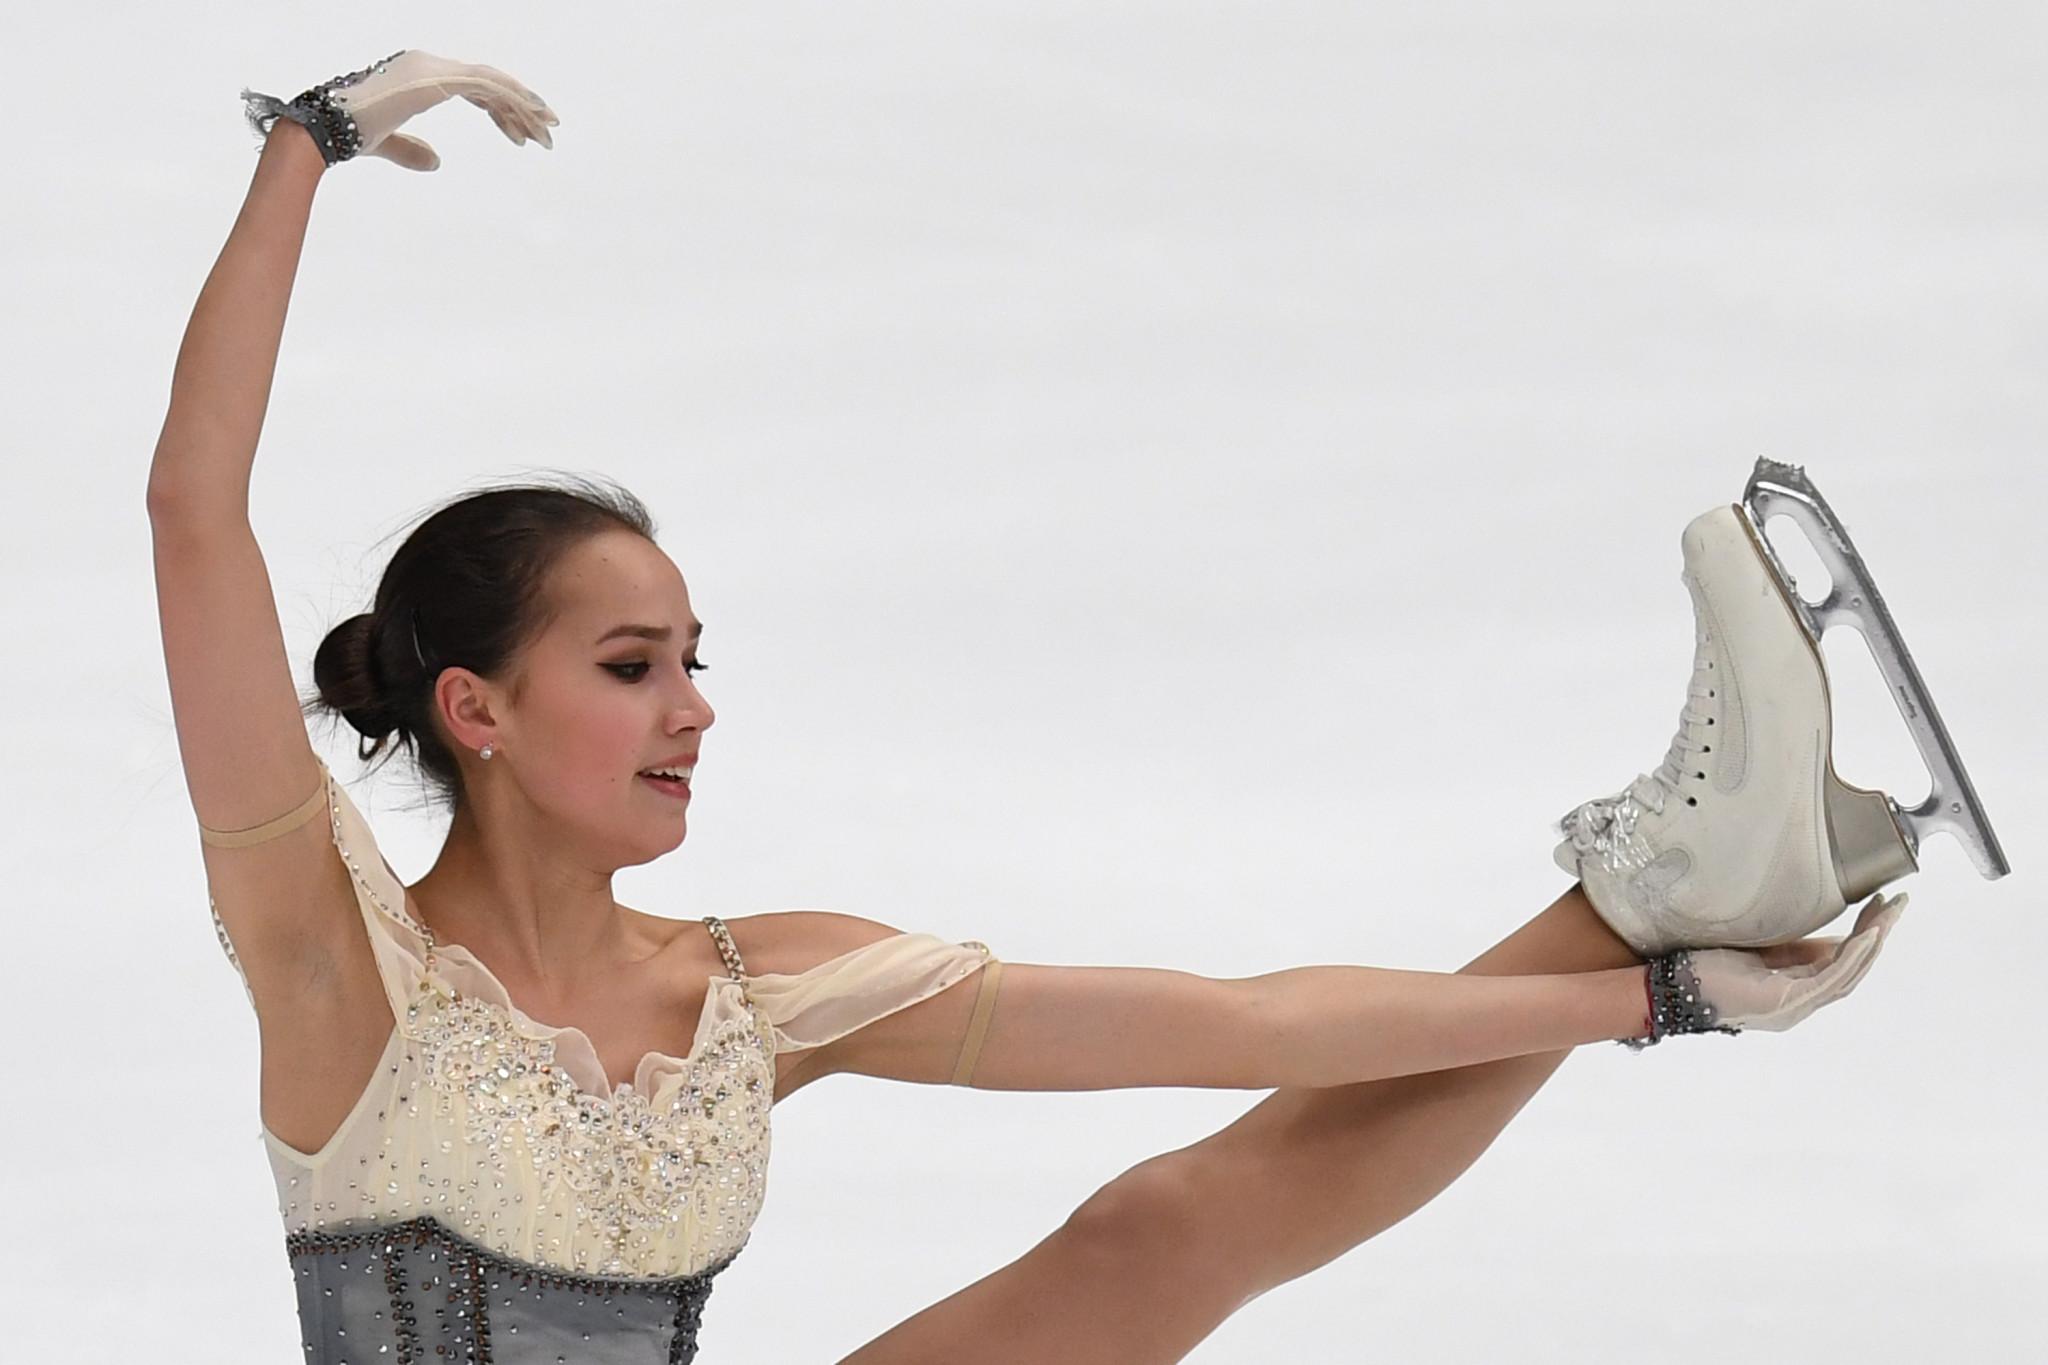 Russia's Alina Zagitova will aim to defend her ladies title ©Getty Images